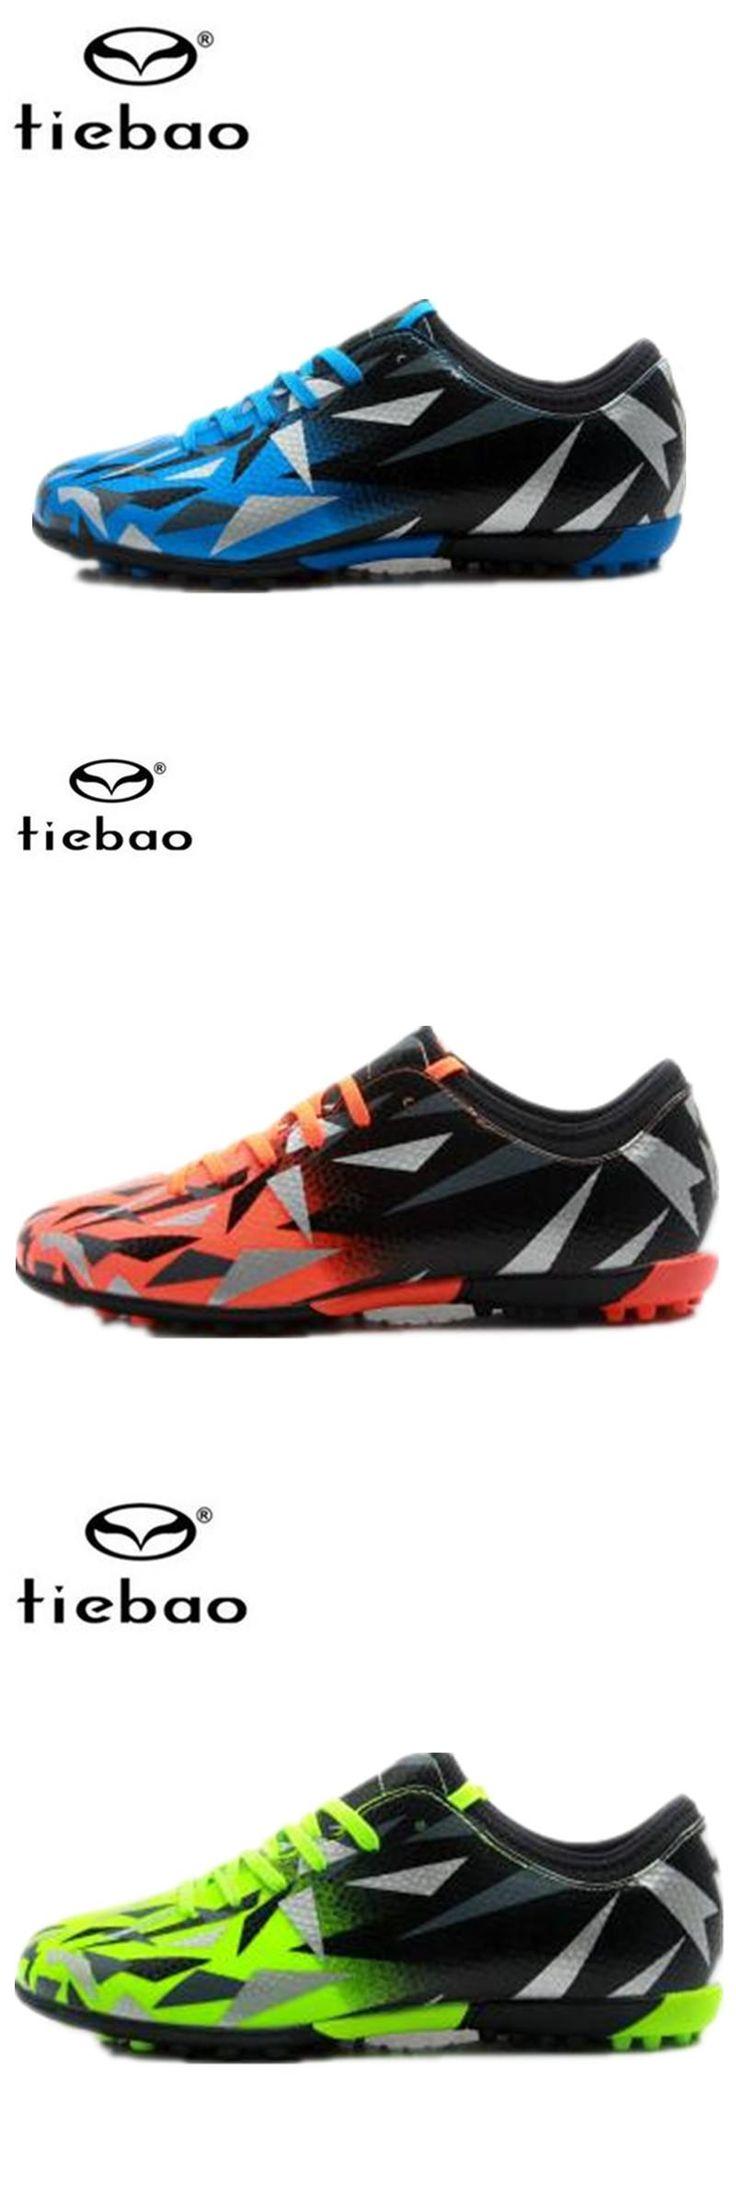 [Visit to Buy] TIEBAO soccer shoes chaussure foot chuteira futebol zapatillas futbol sala hombres shoes football fussball schuhe voetbal schoen #Advertisement